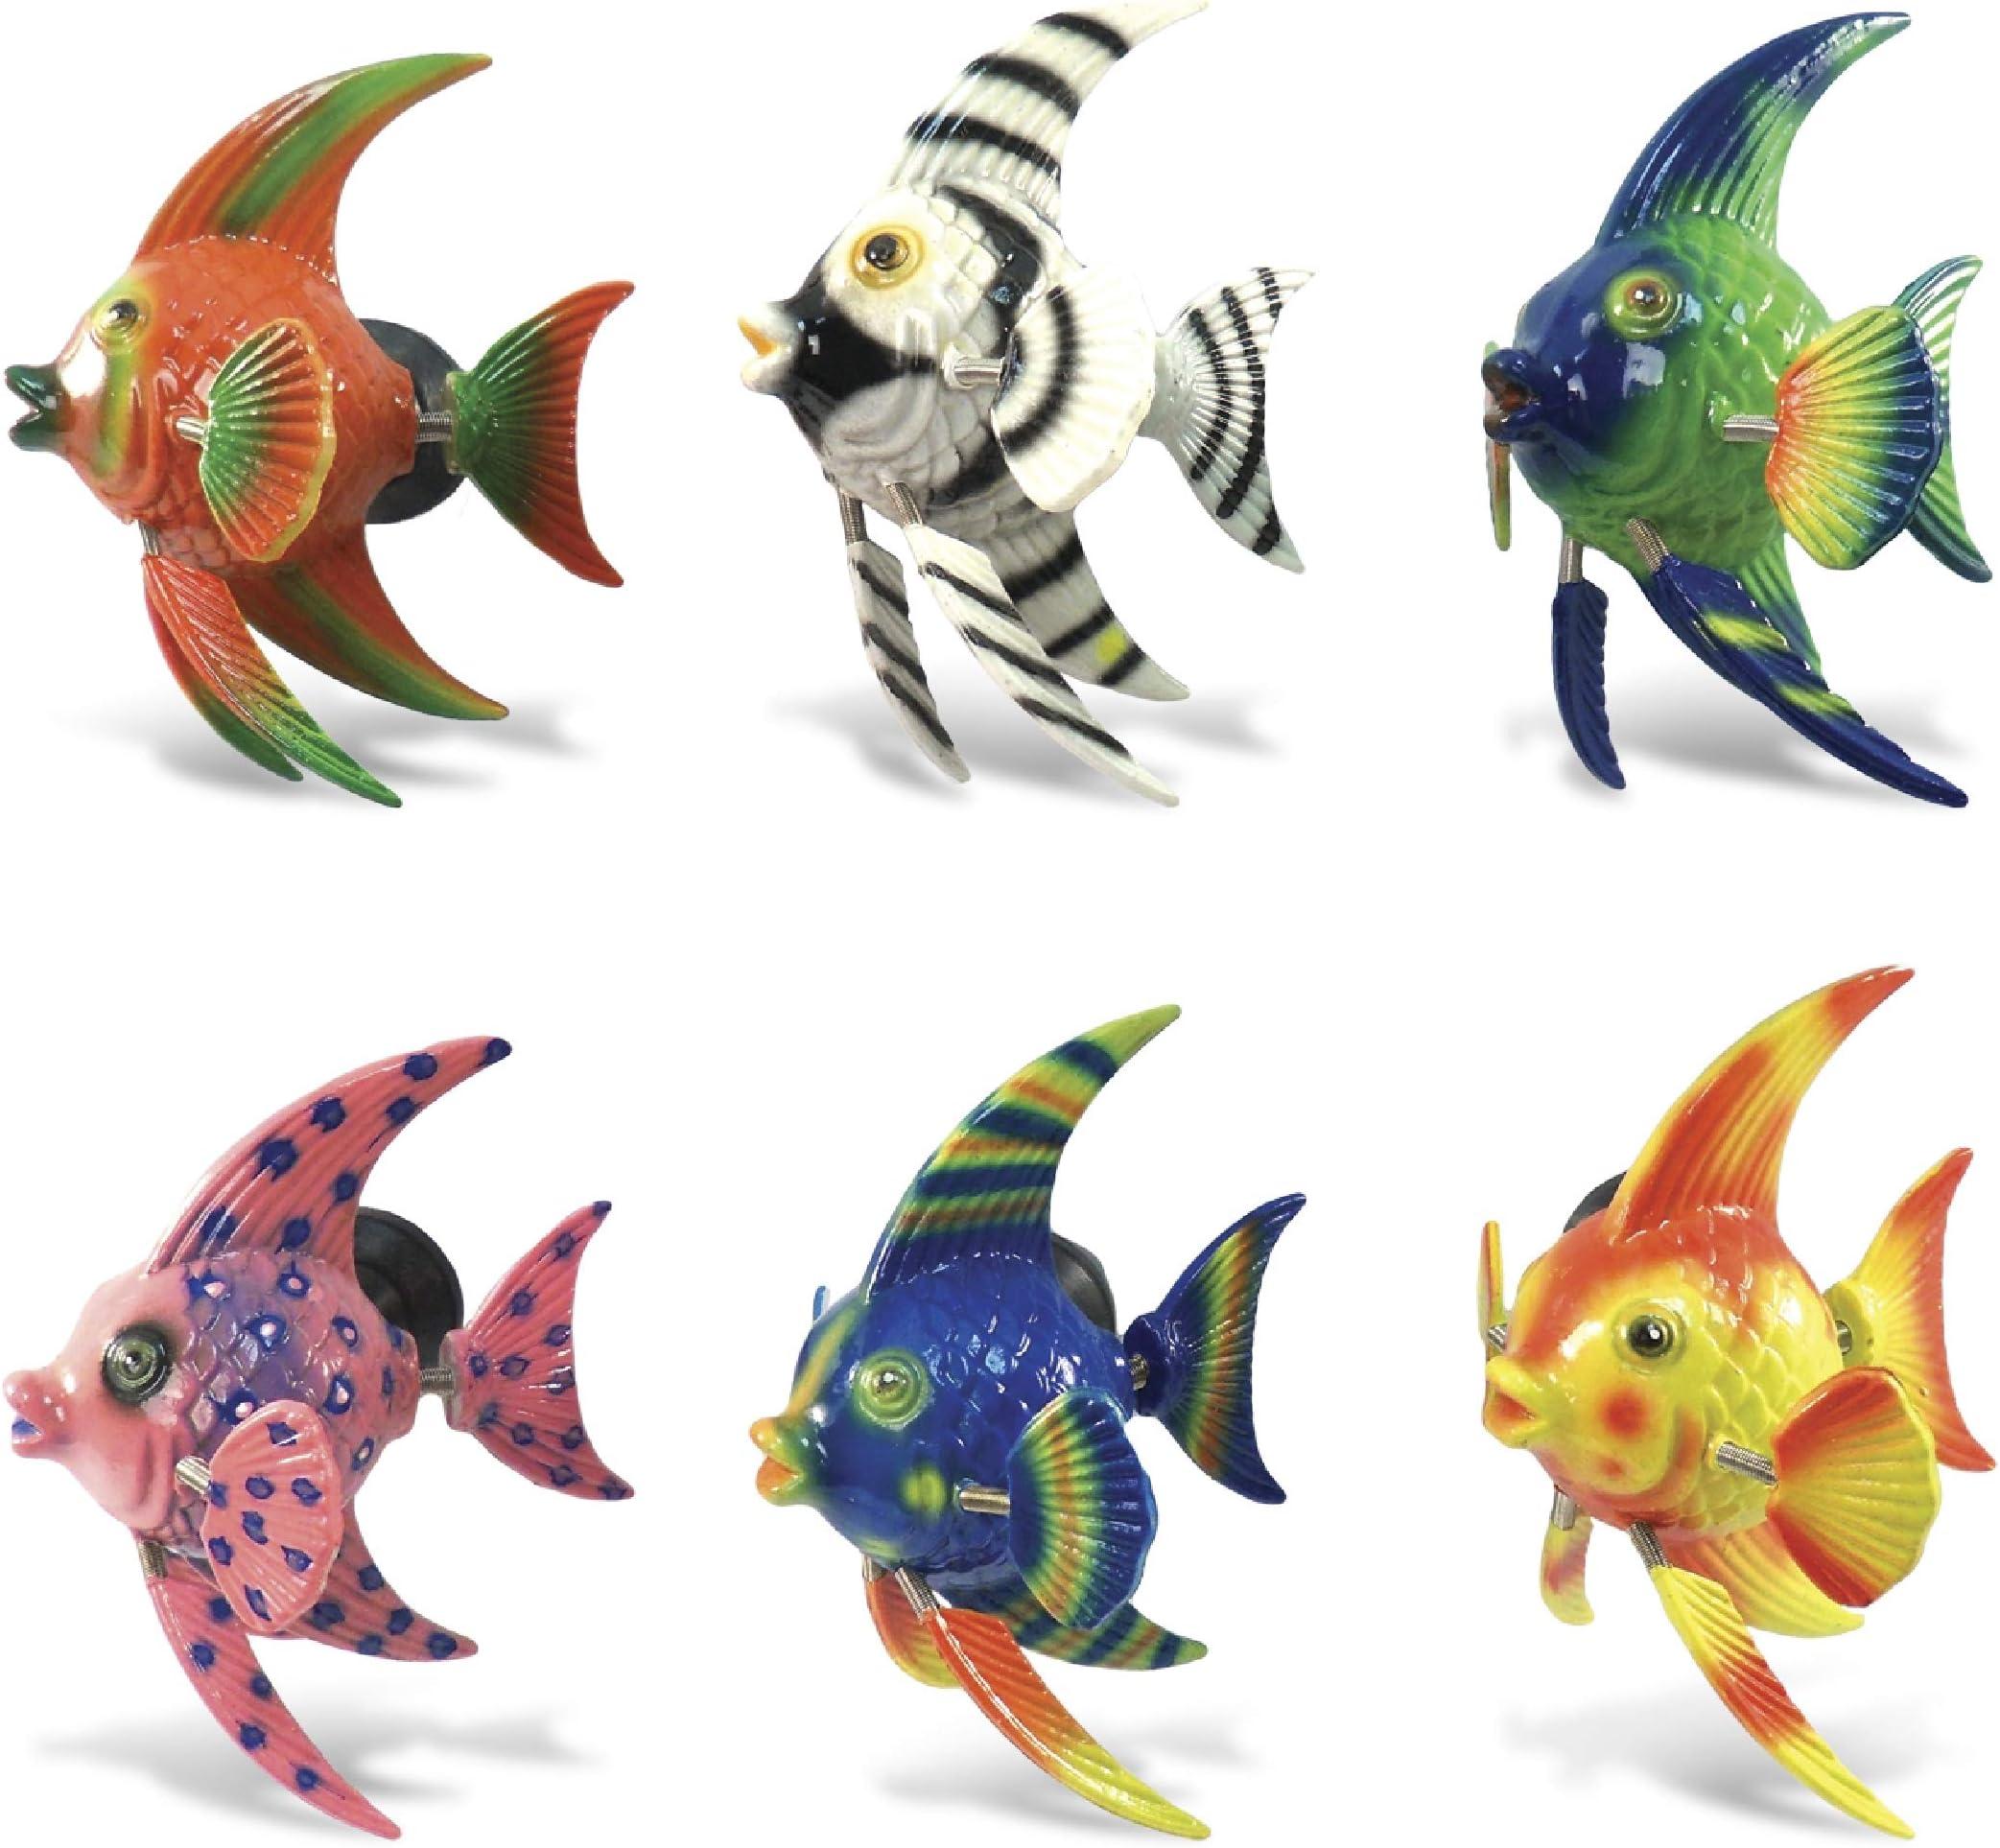 Ocean Refrigerator Magnets 14 Sea Life Fish Seahorses Jellyfish Seaweed Starfish Fridge Magnet Set 2